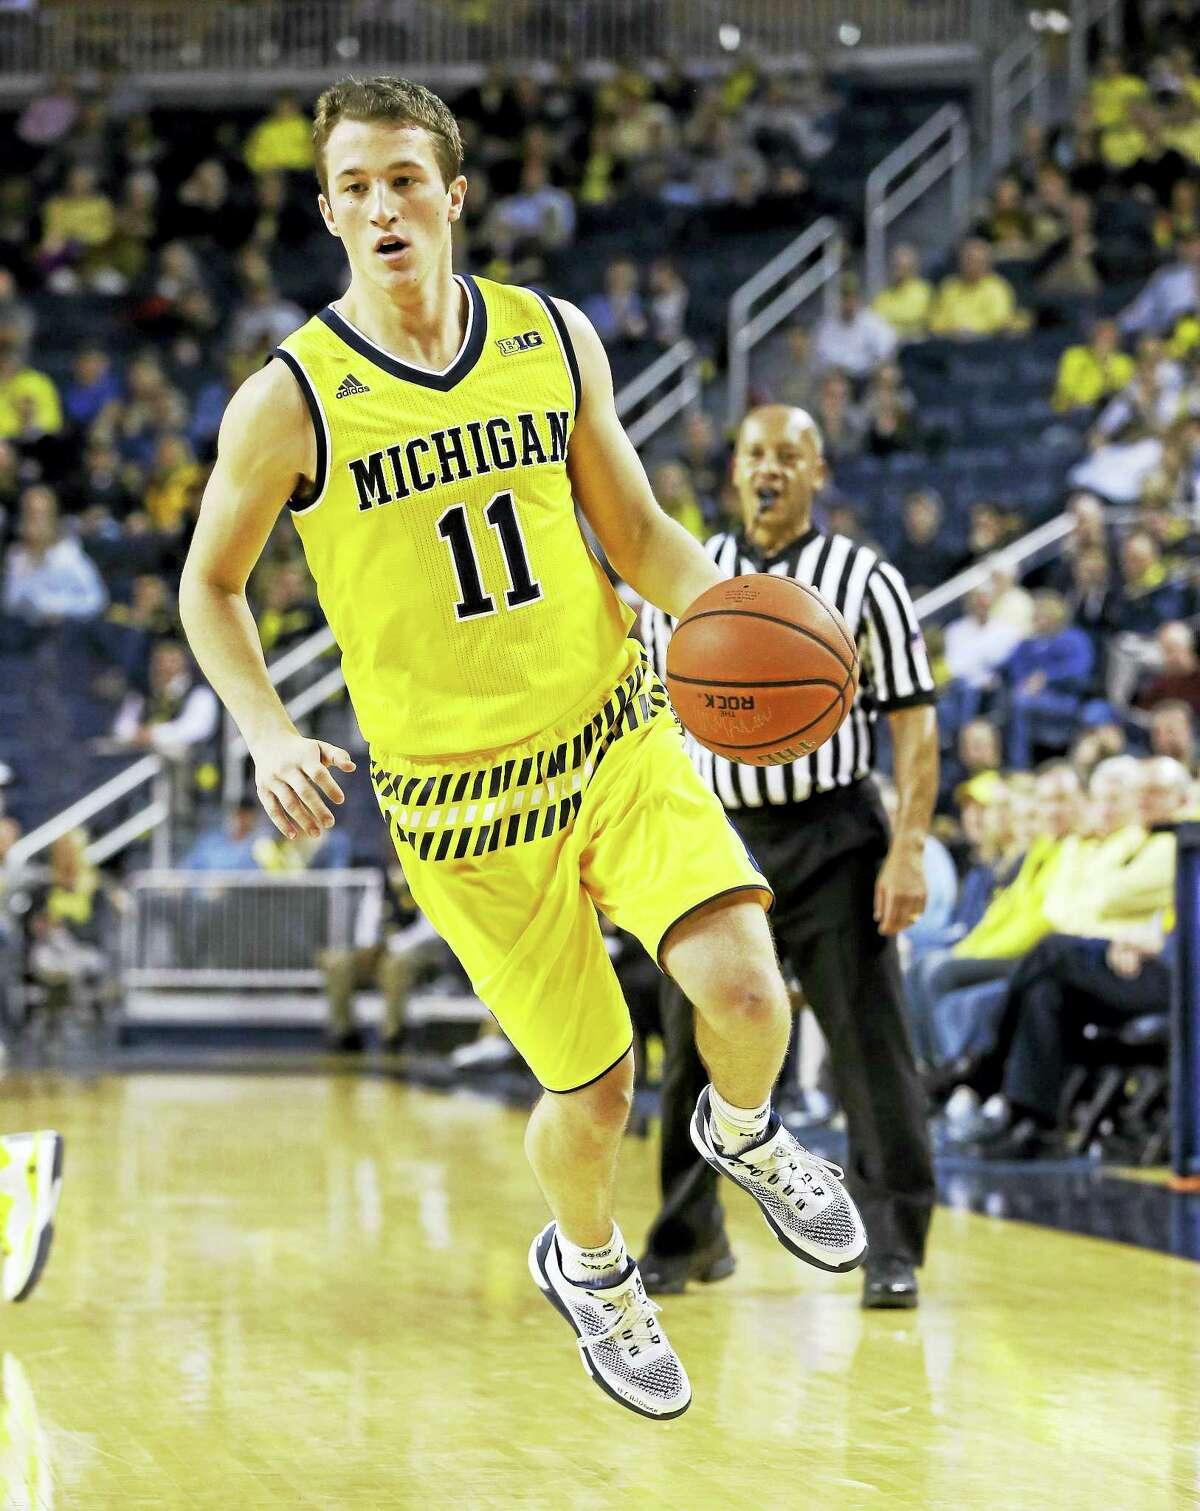 Michigan guard Andrew Dakich says he is transferring to Quinnipiac.